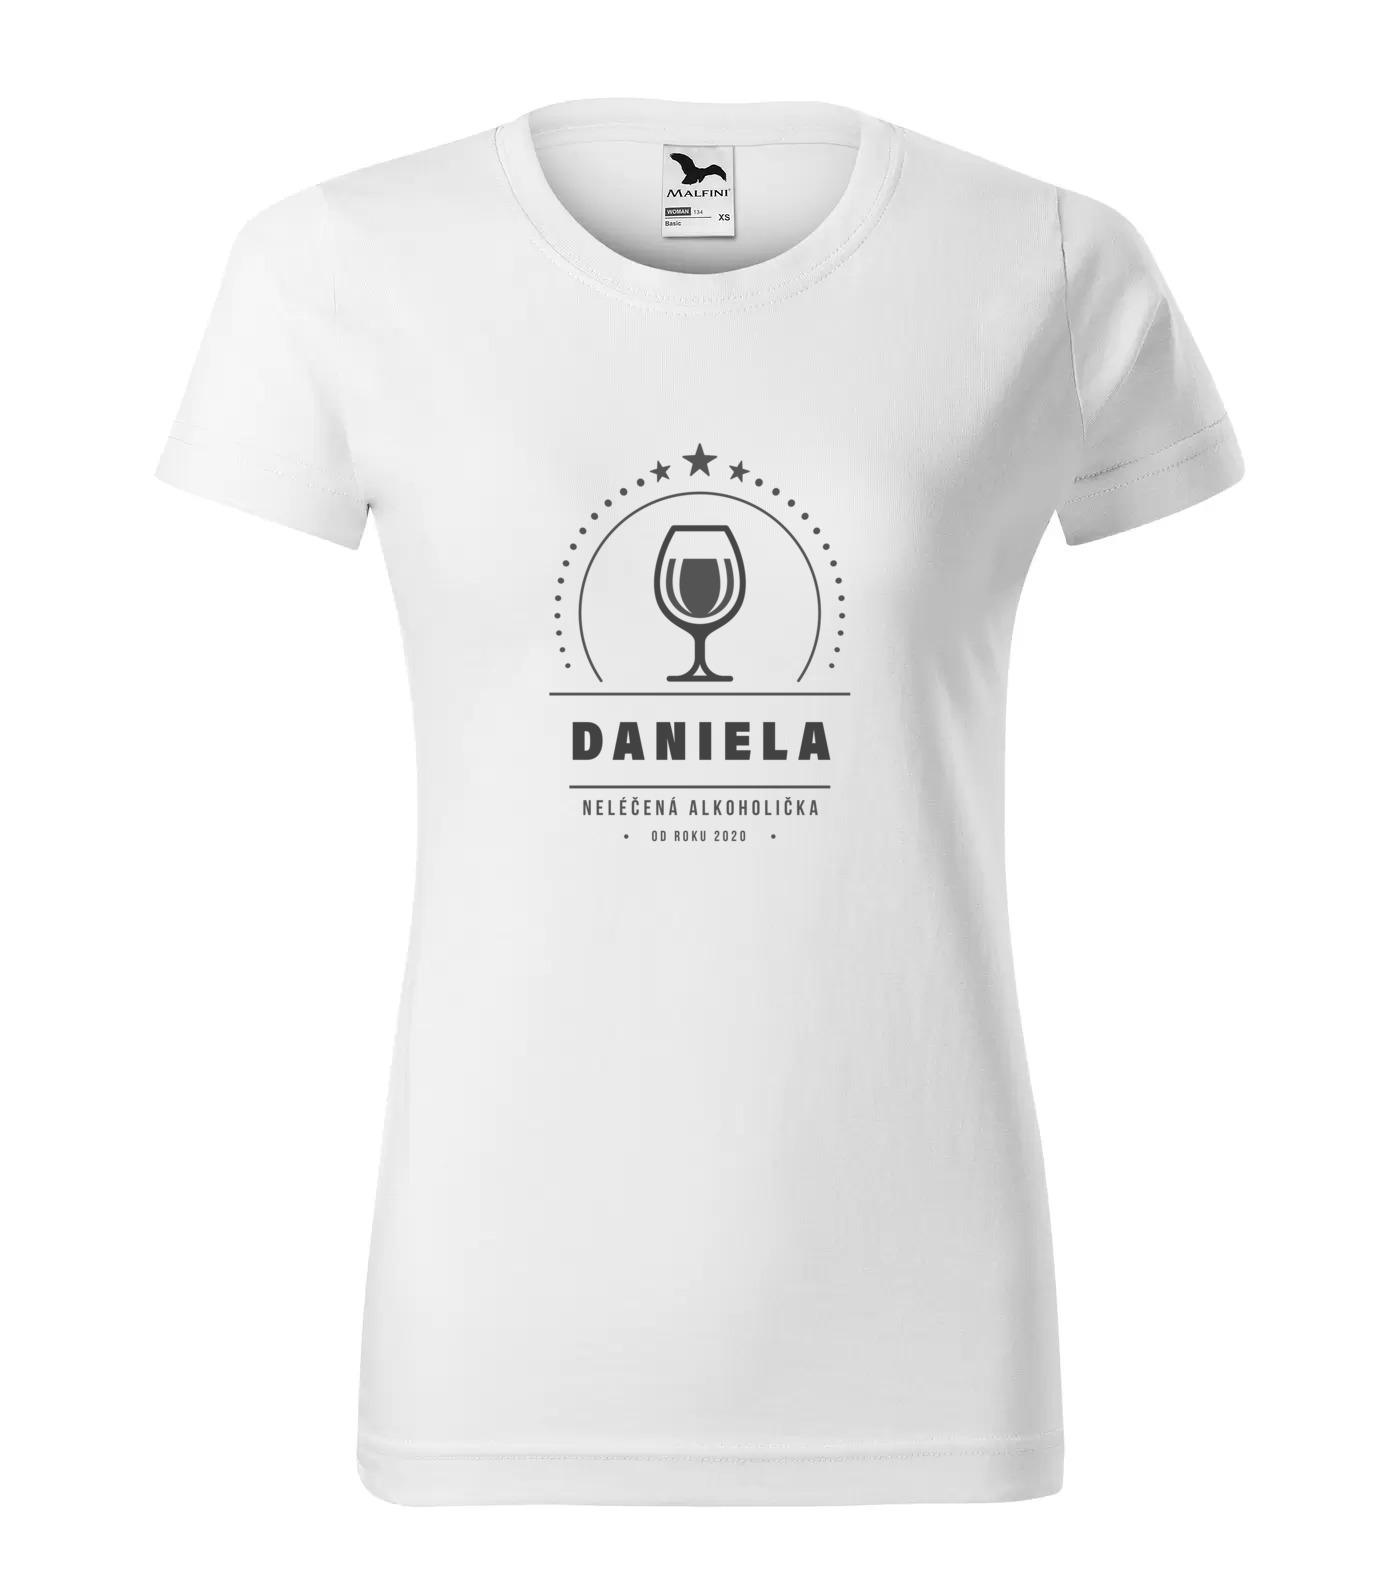 Tričko Alkoholička Daniela